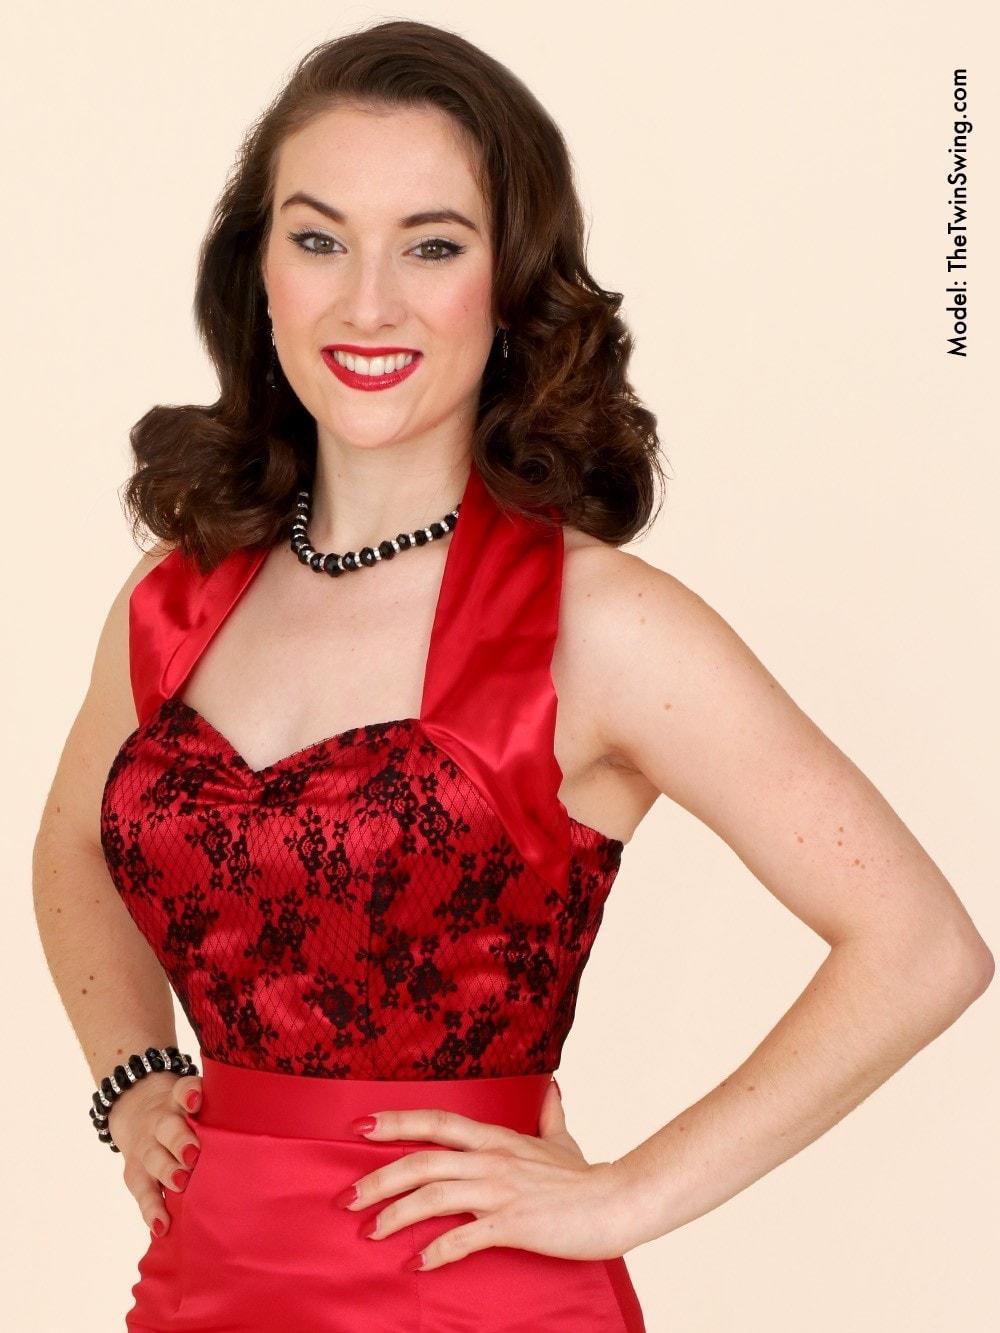 052350895f2 Halterneck Top Luxury Red Satin Black Lace